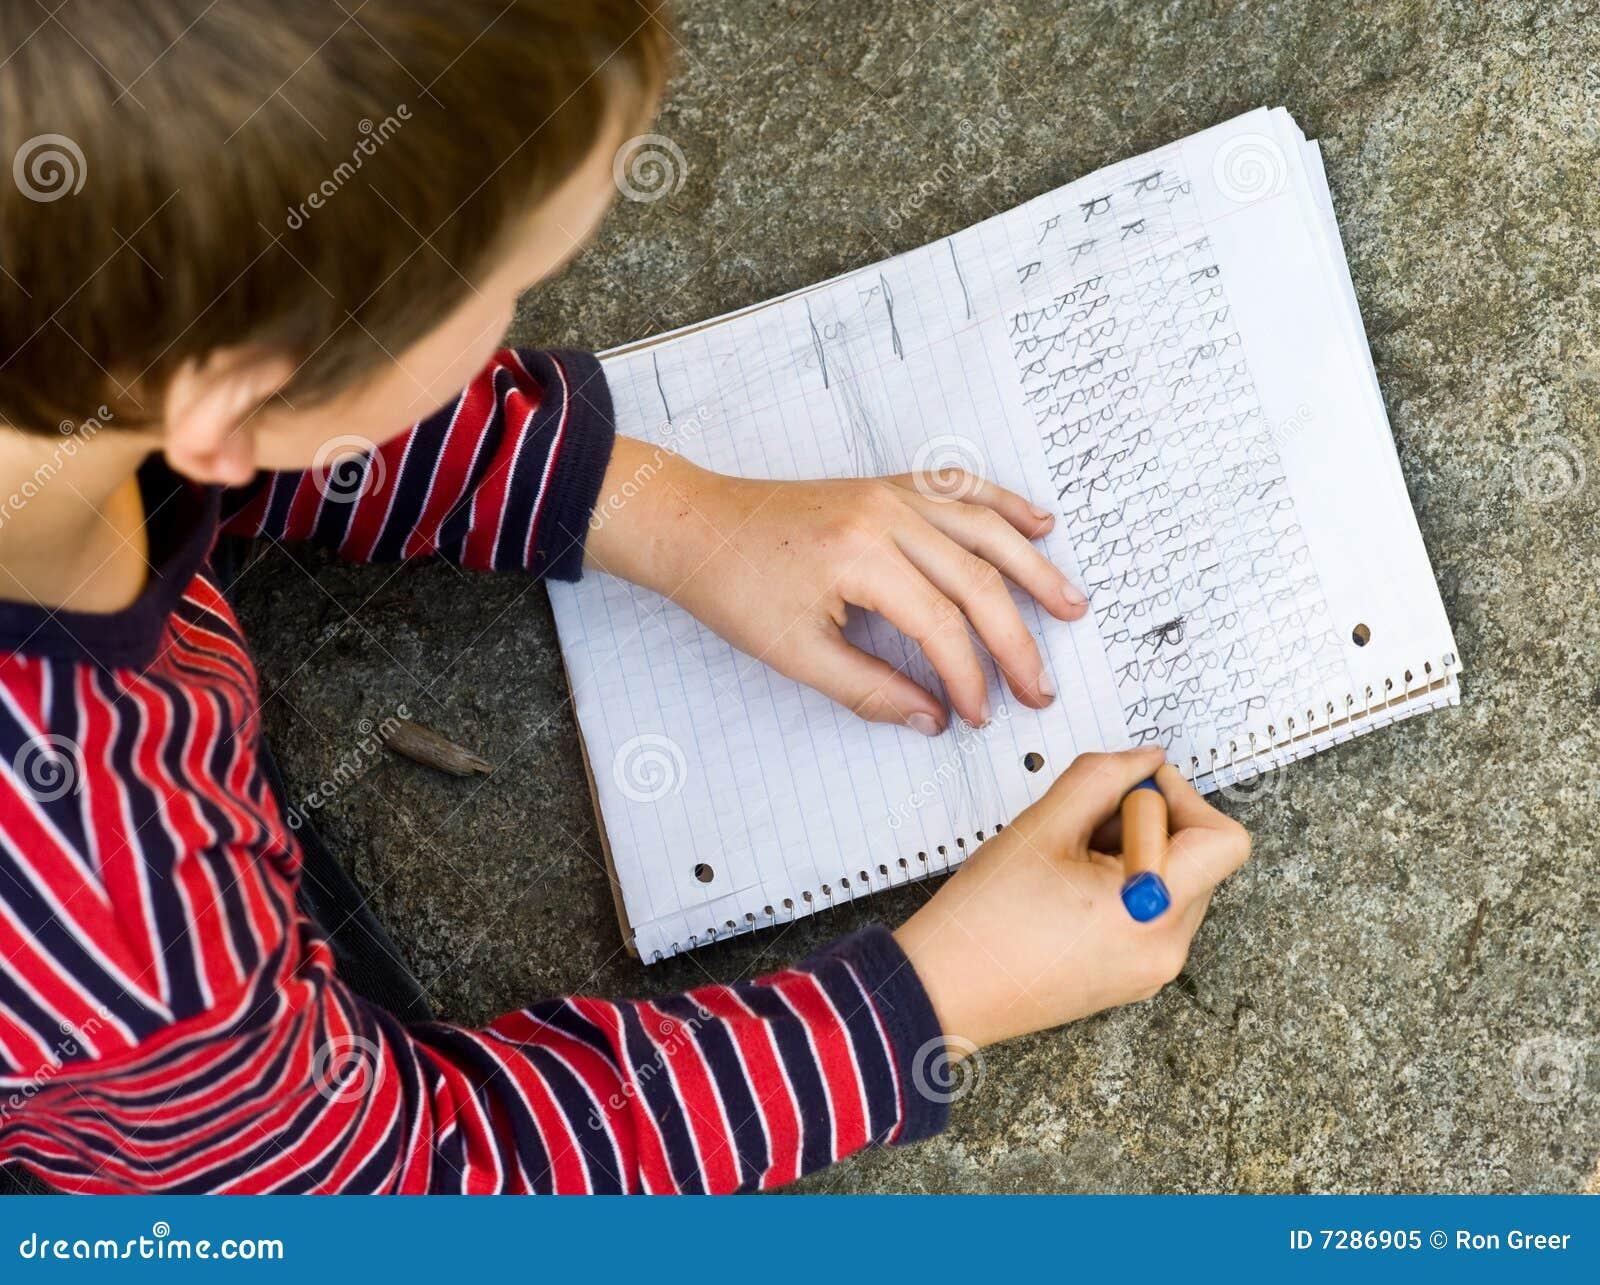 English essay story